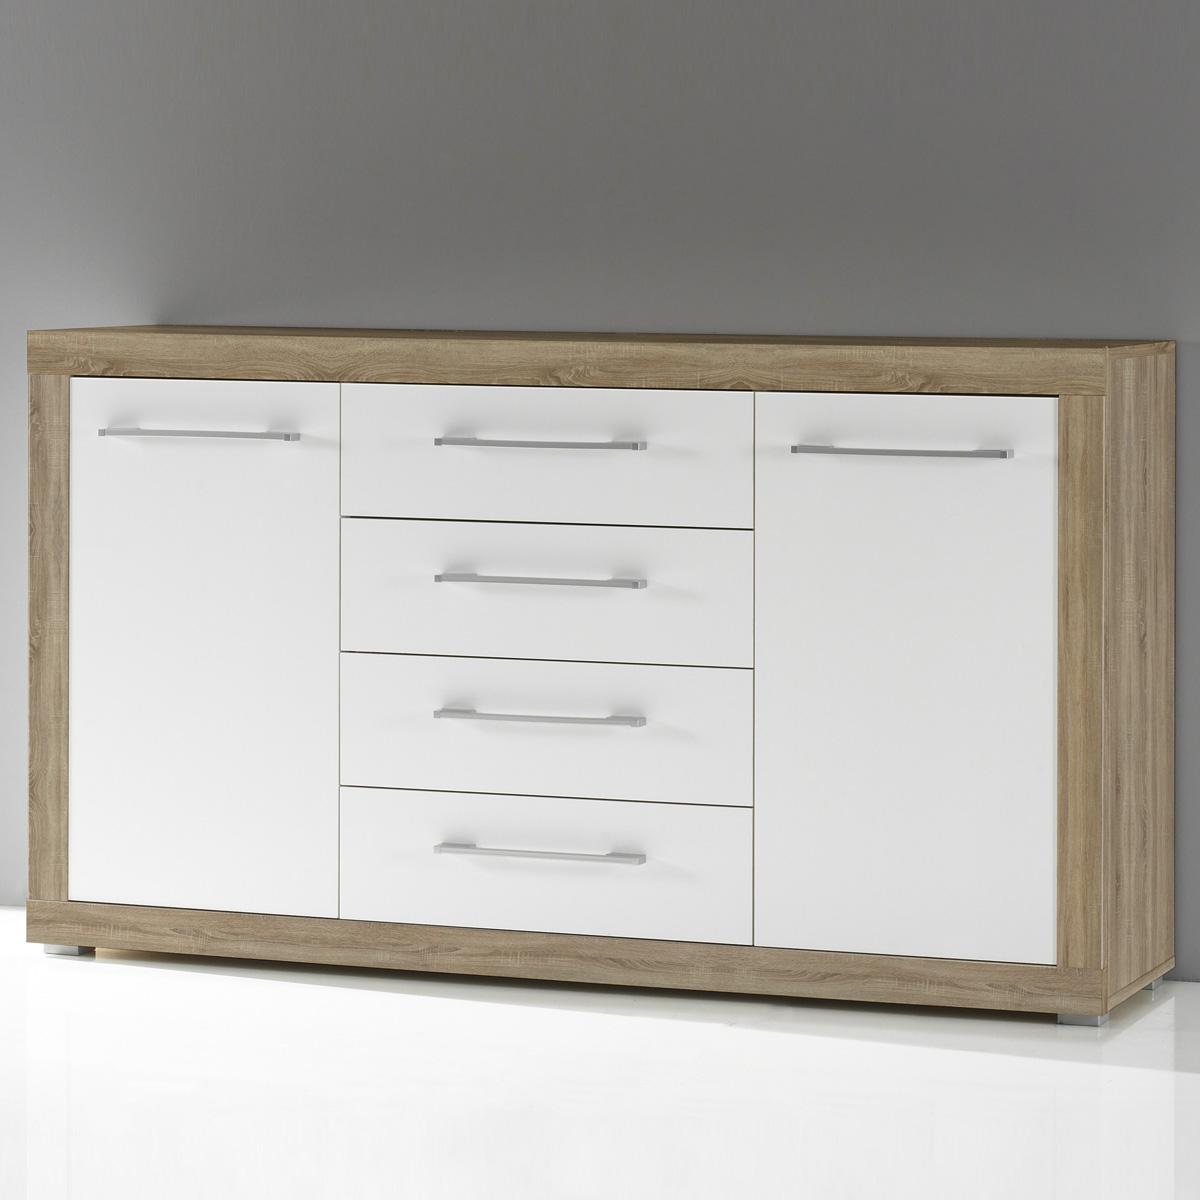 sideboard cabo in sonoma eiche s gerau und wei glanz. Black Bedroom Furniture Sets. Home Design Ideas